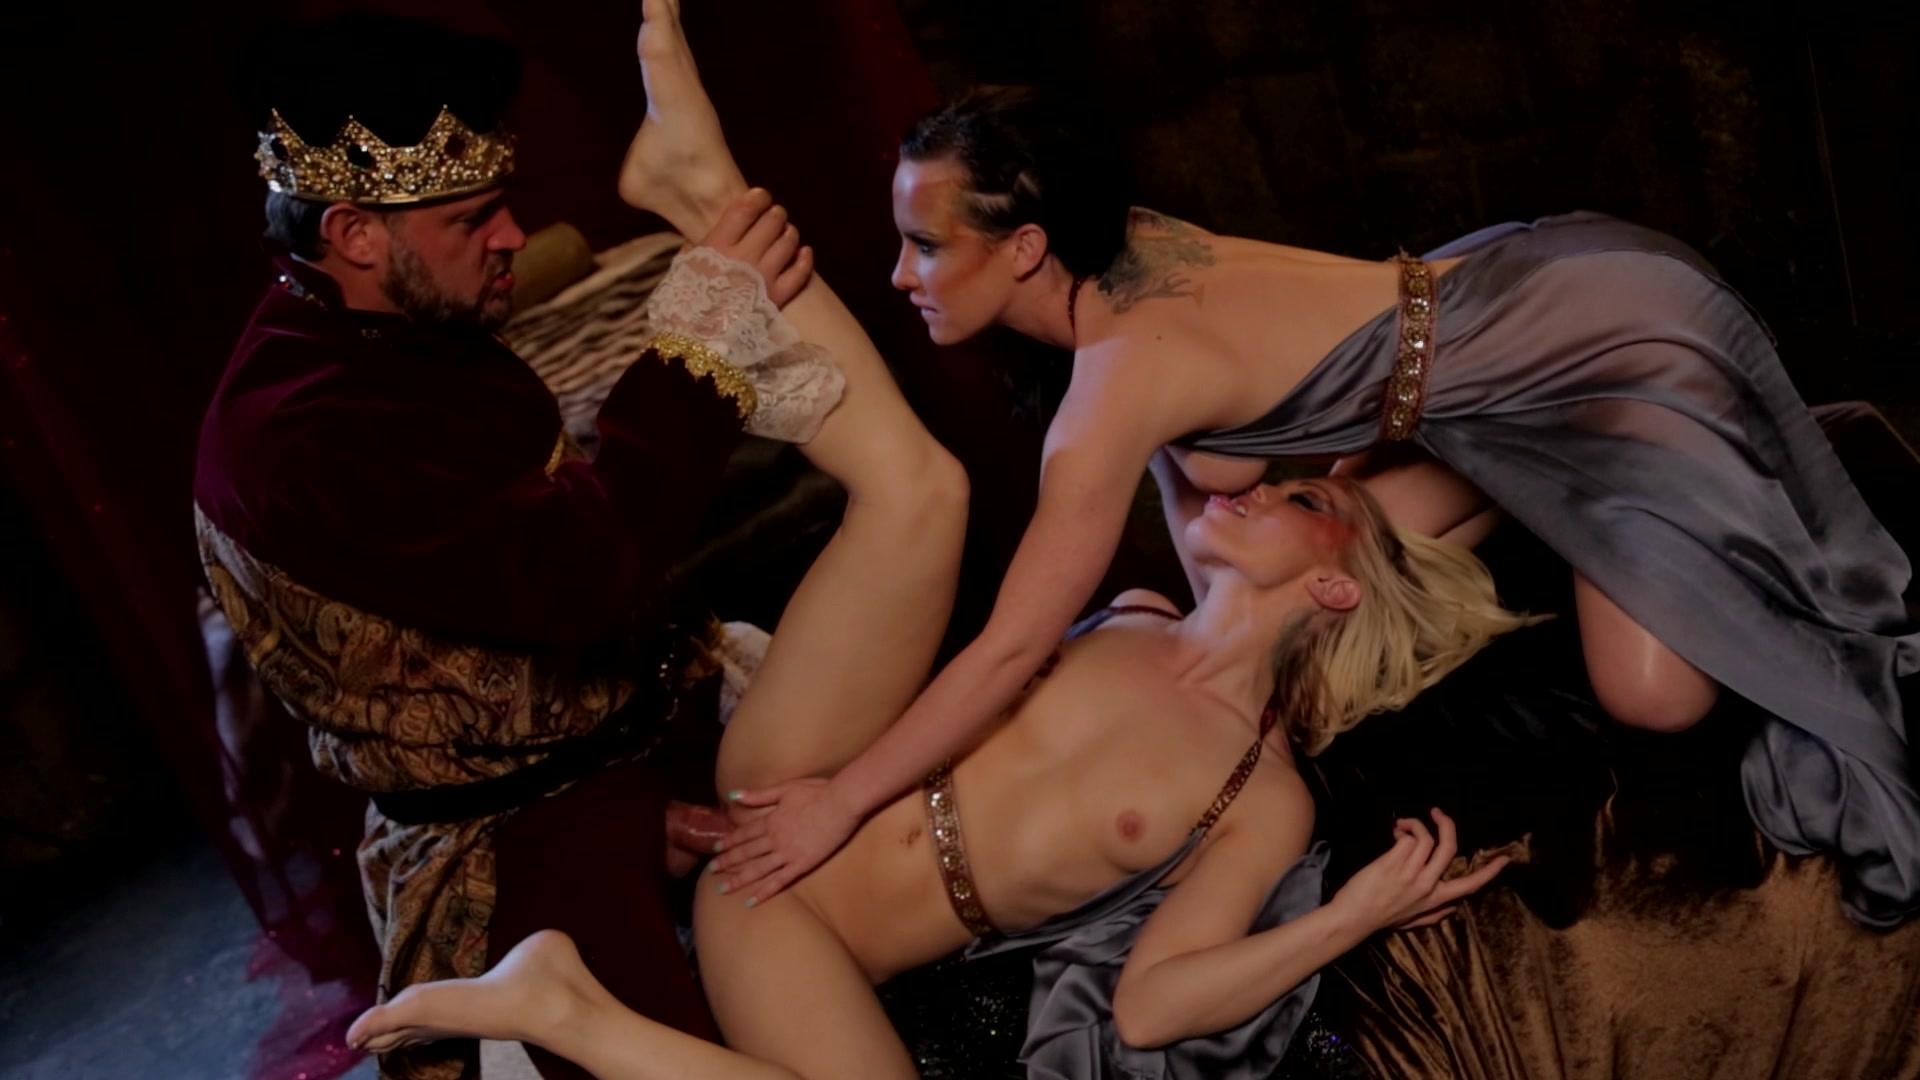 Порно король и королева онлайн без